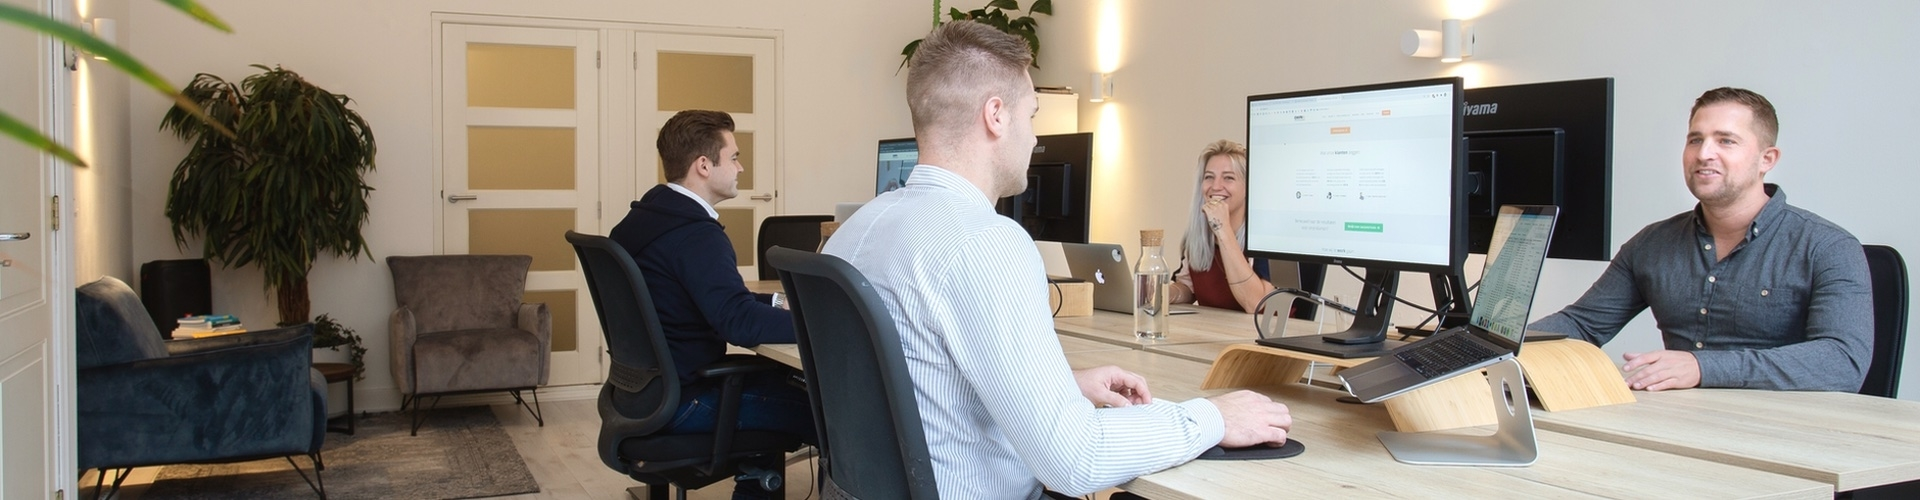 Team Ompro - Online marketing professionals